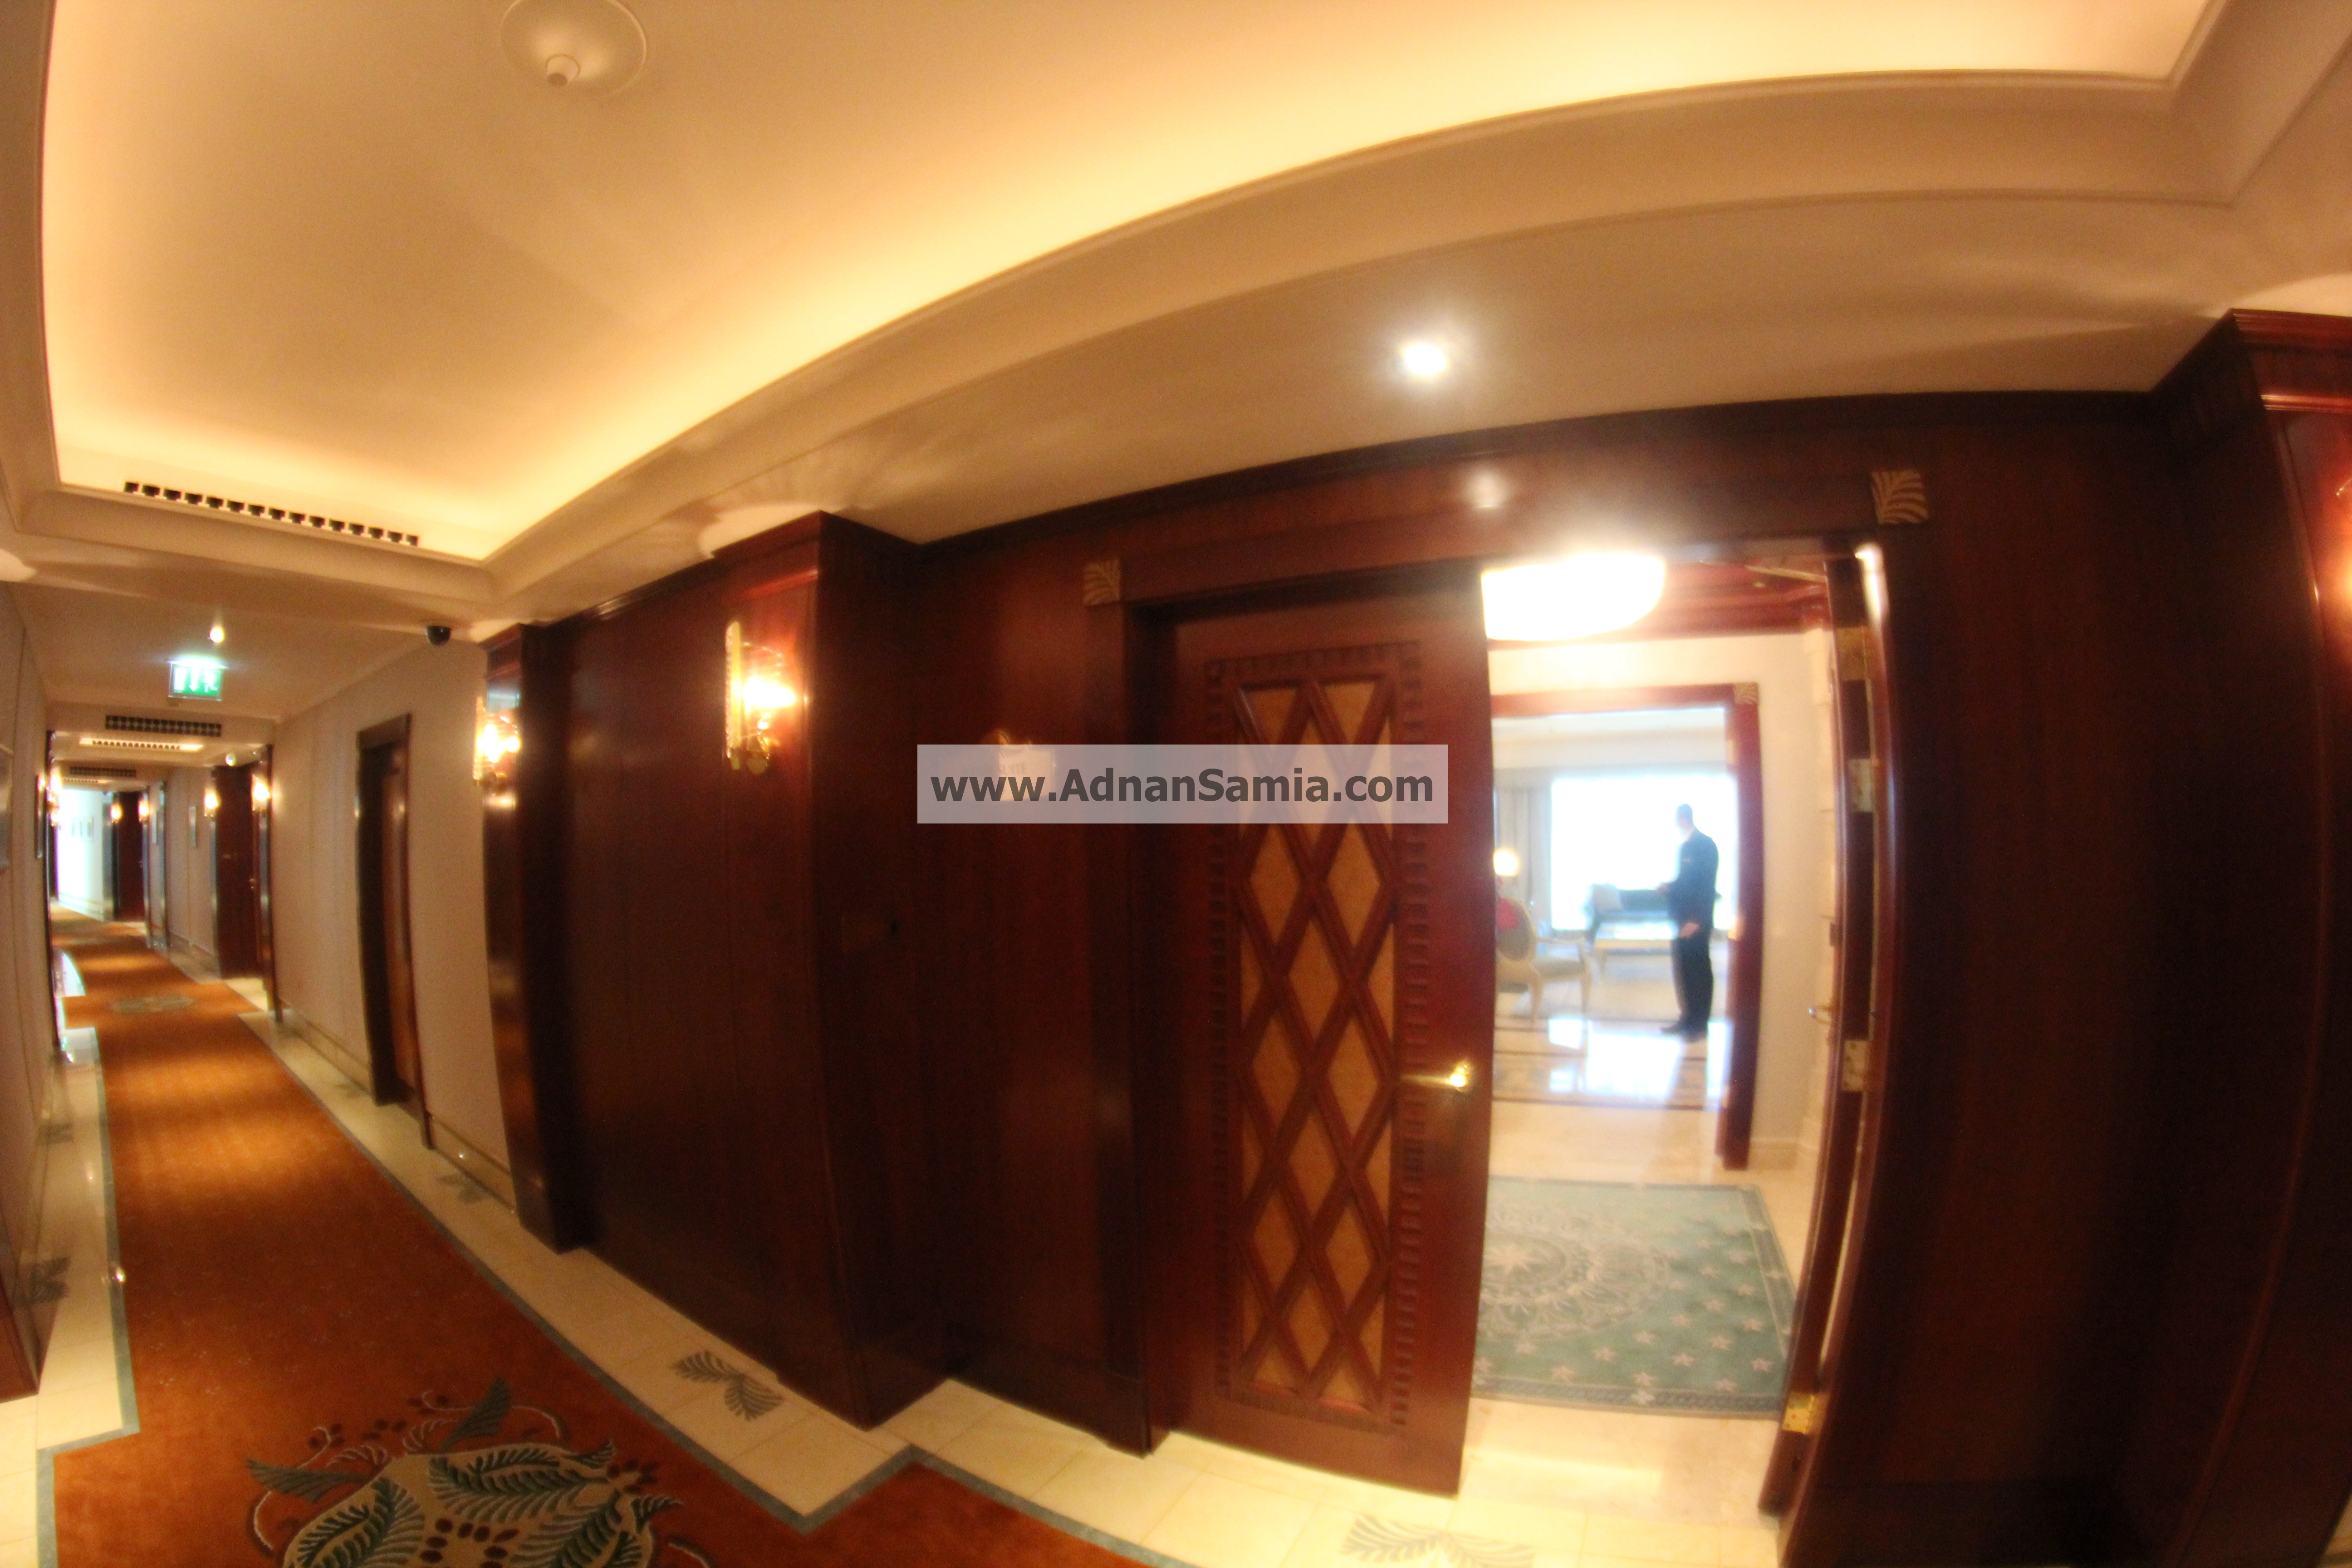 Grand hyatt dubai adnan n samia for 14th and grand salon